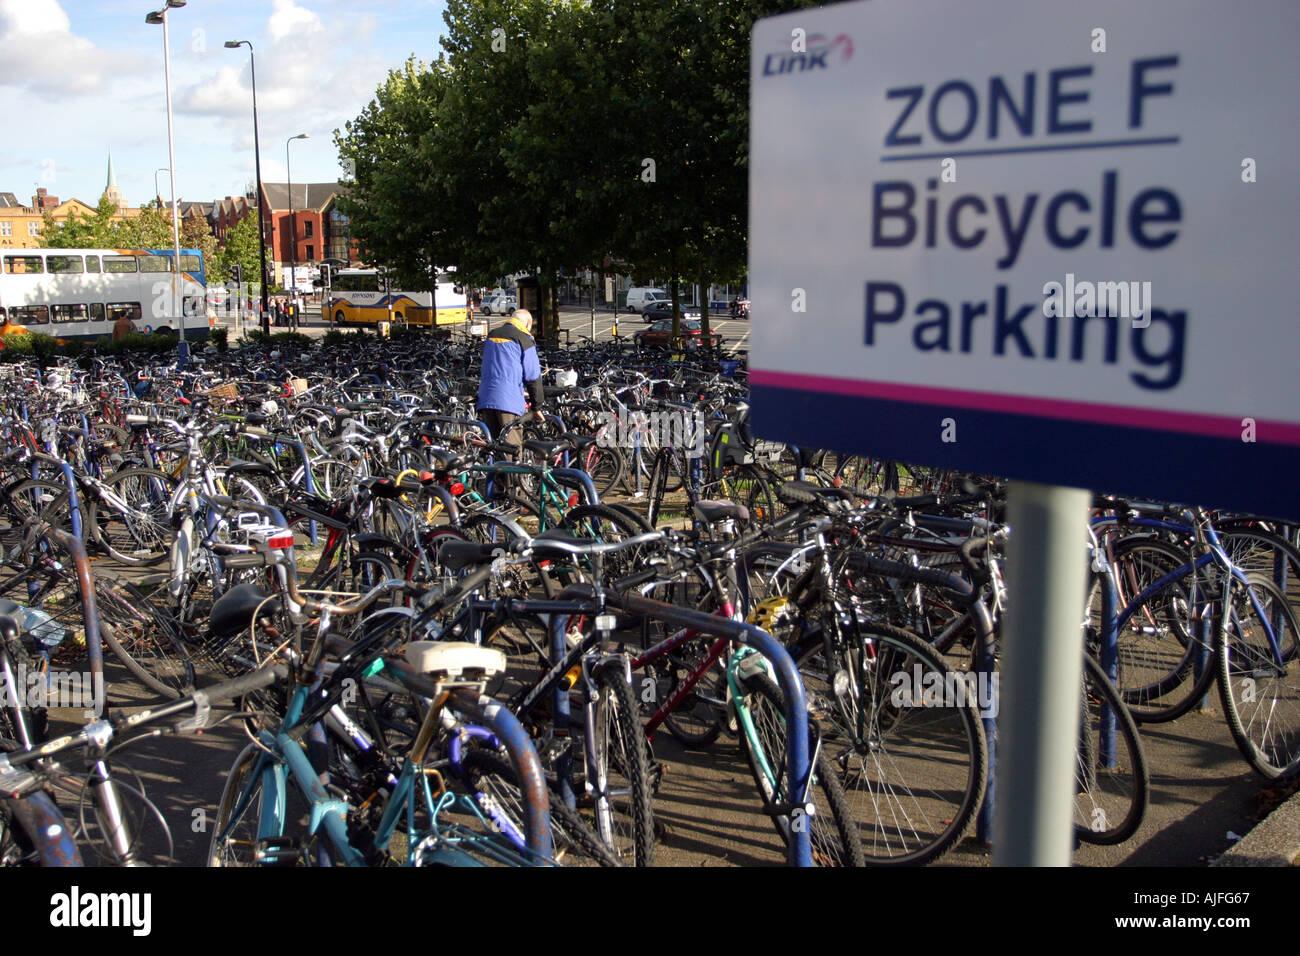 Bike Parking Zone - Stock Image